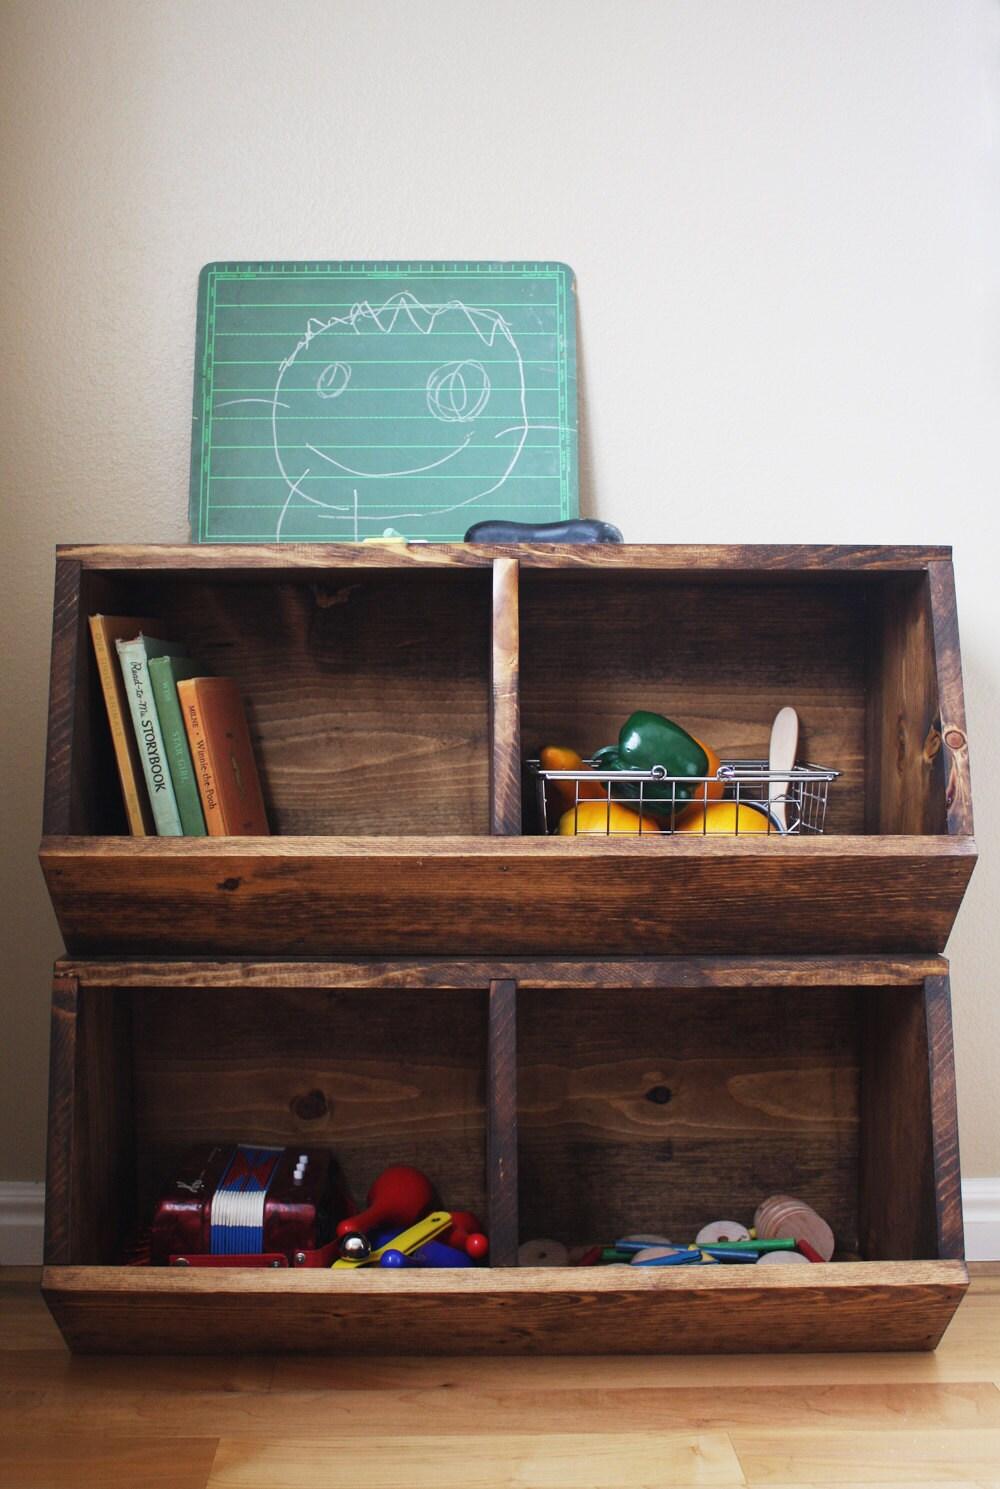 toy storage bins woodworking plans. Black Bedroom Furniture Sets. Home Design Ideas